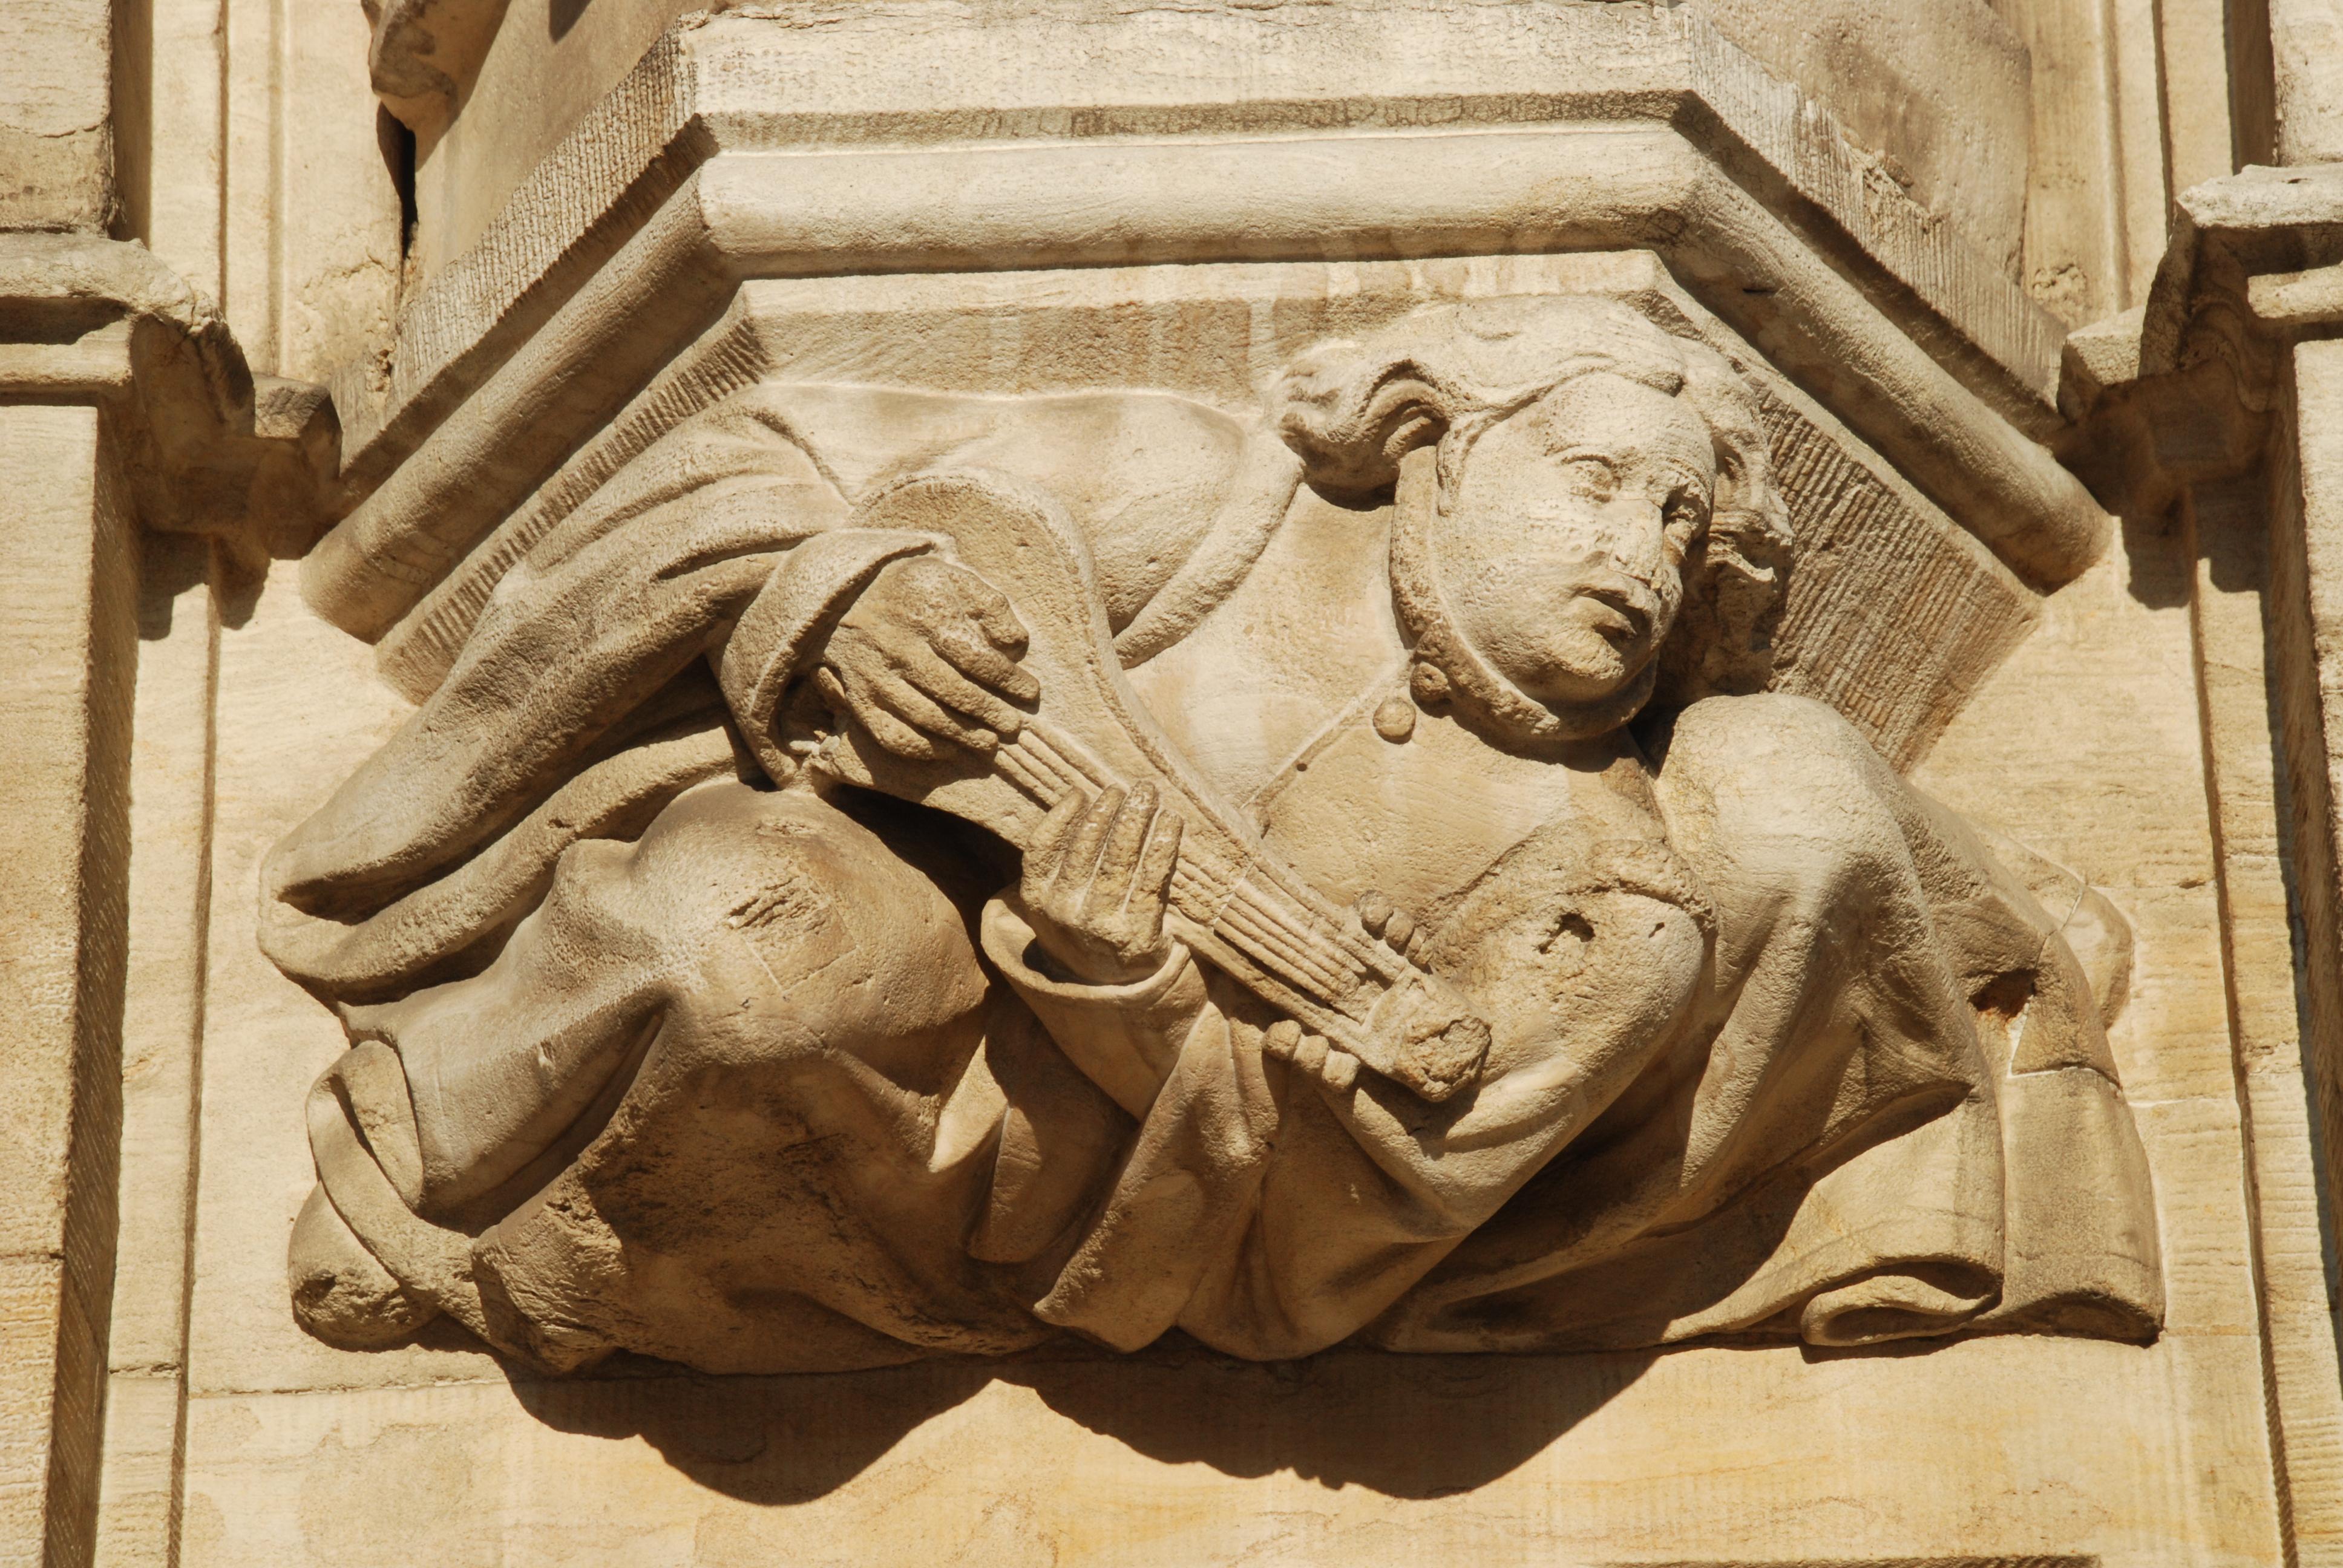 File:Hôtel de ville de Bruxelles - Cul de lampe 02.JPG